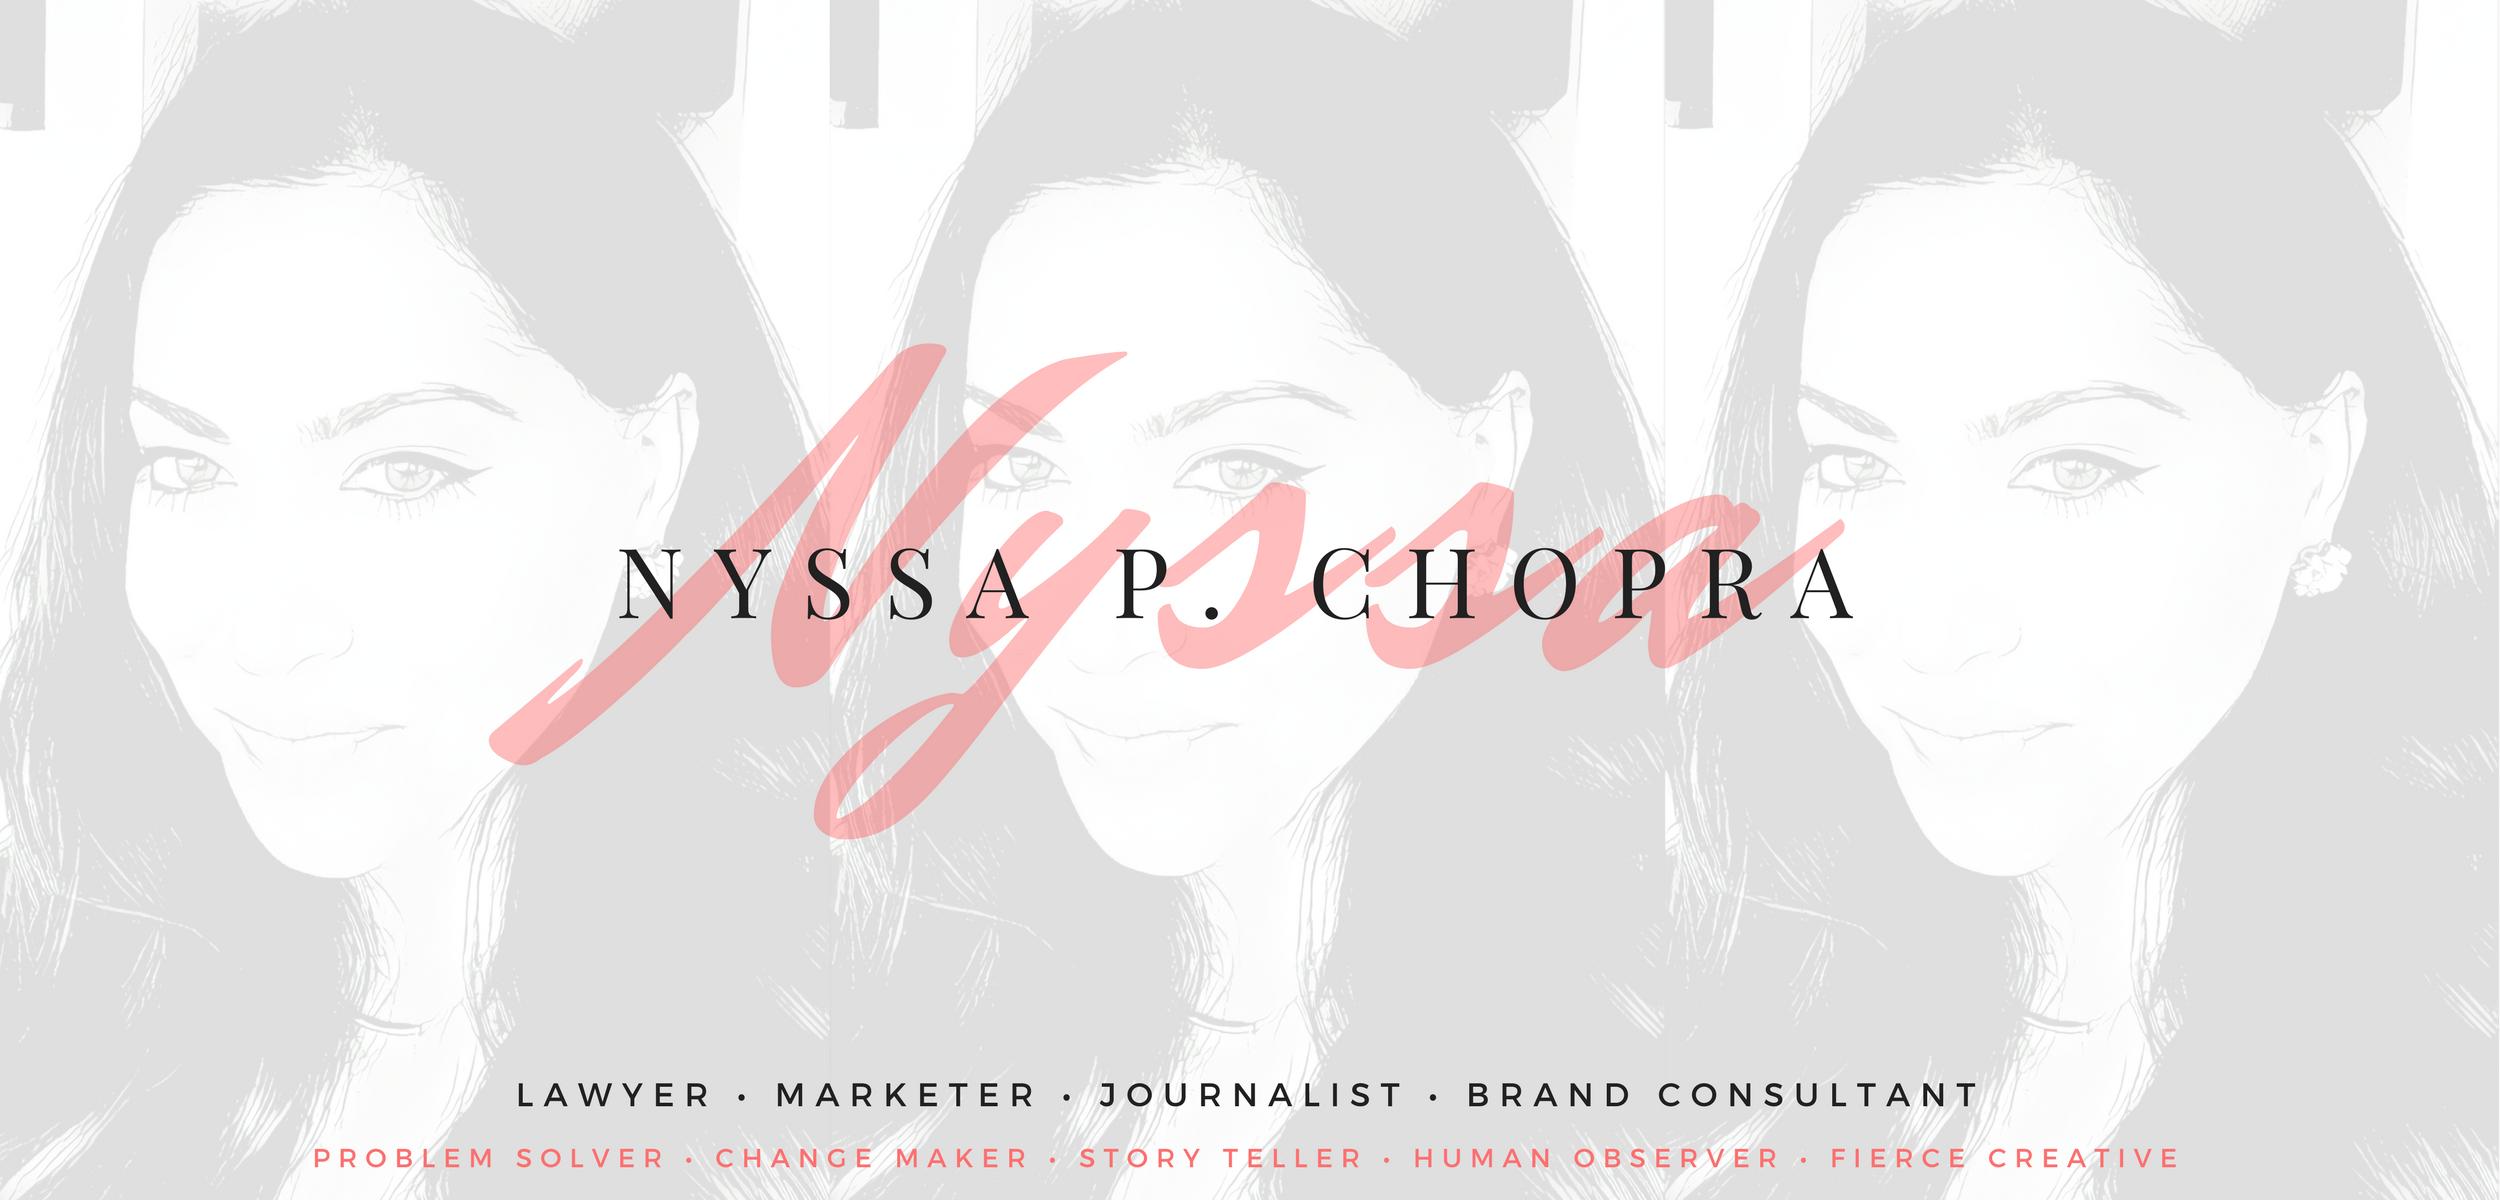 Nyssa P. Chopra